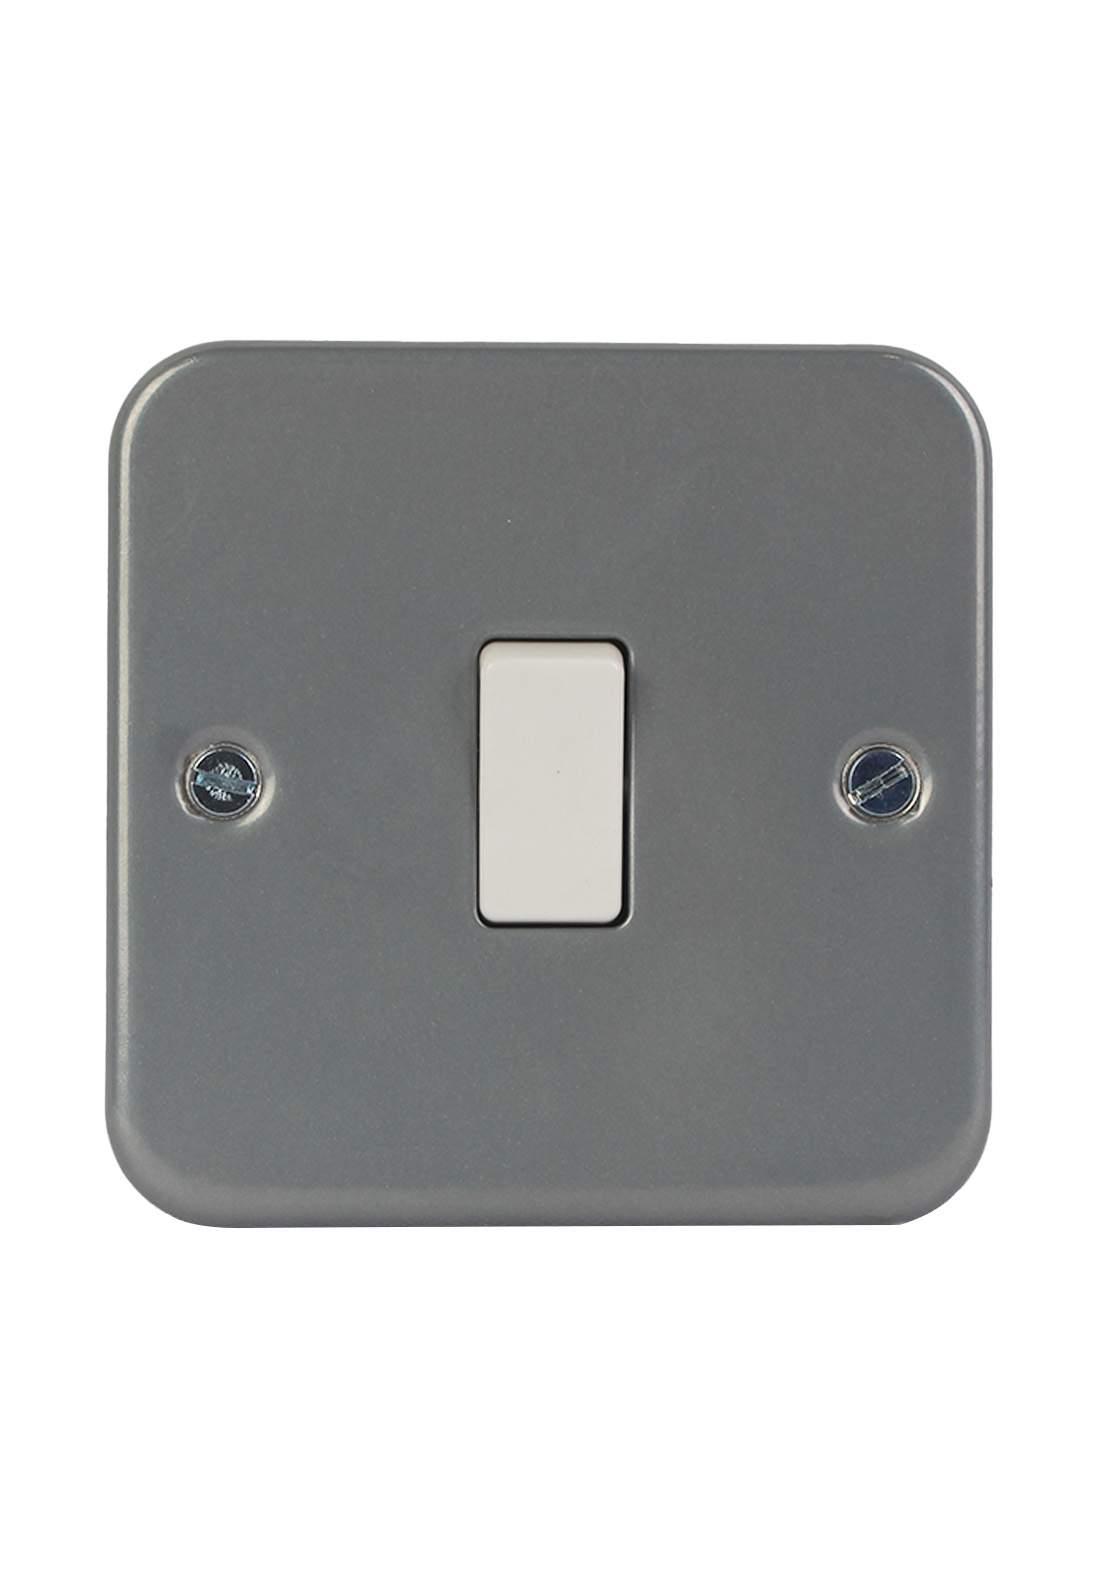 Bg MC512 Switch 10A مفتاح كهربائي (بلك)